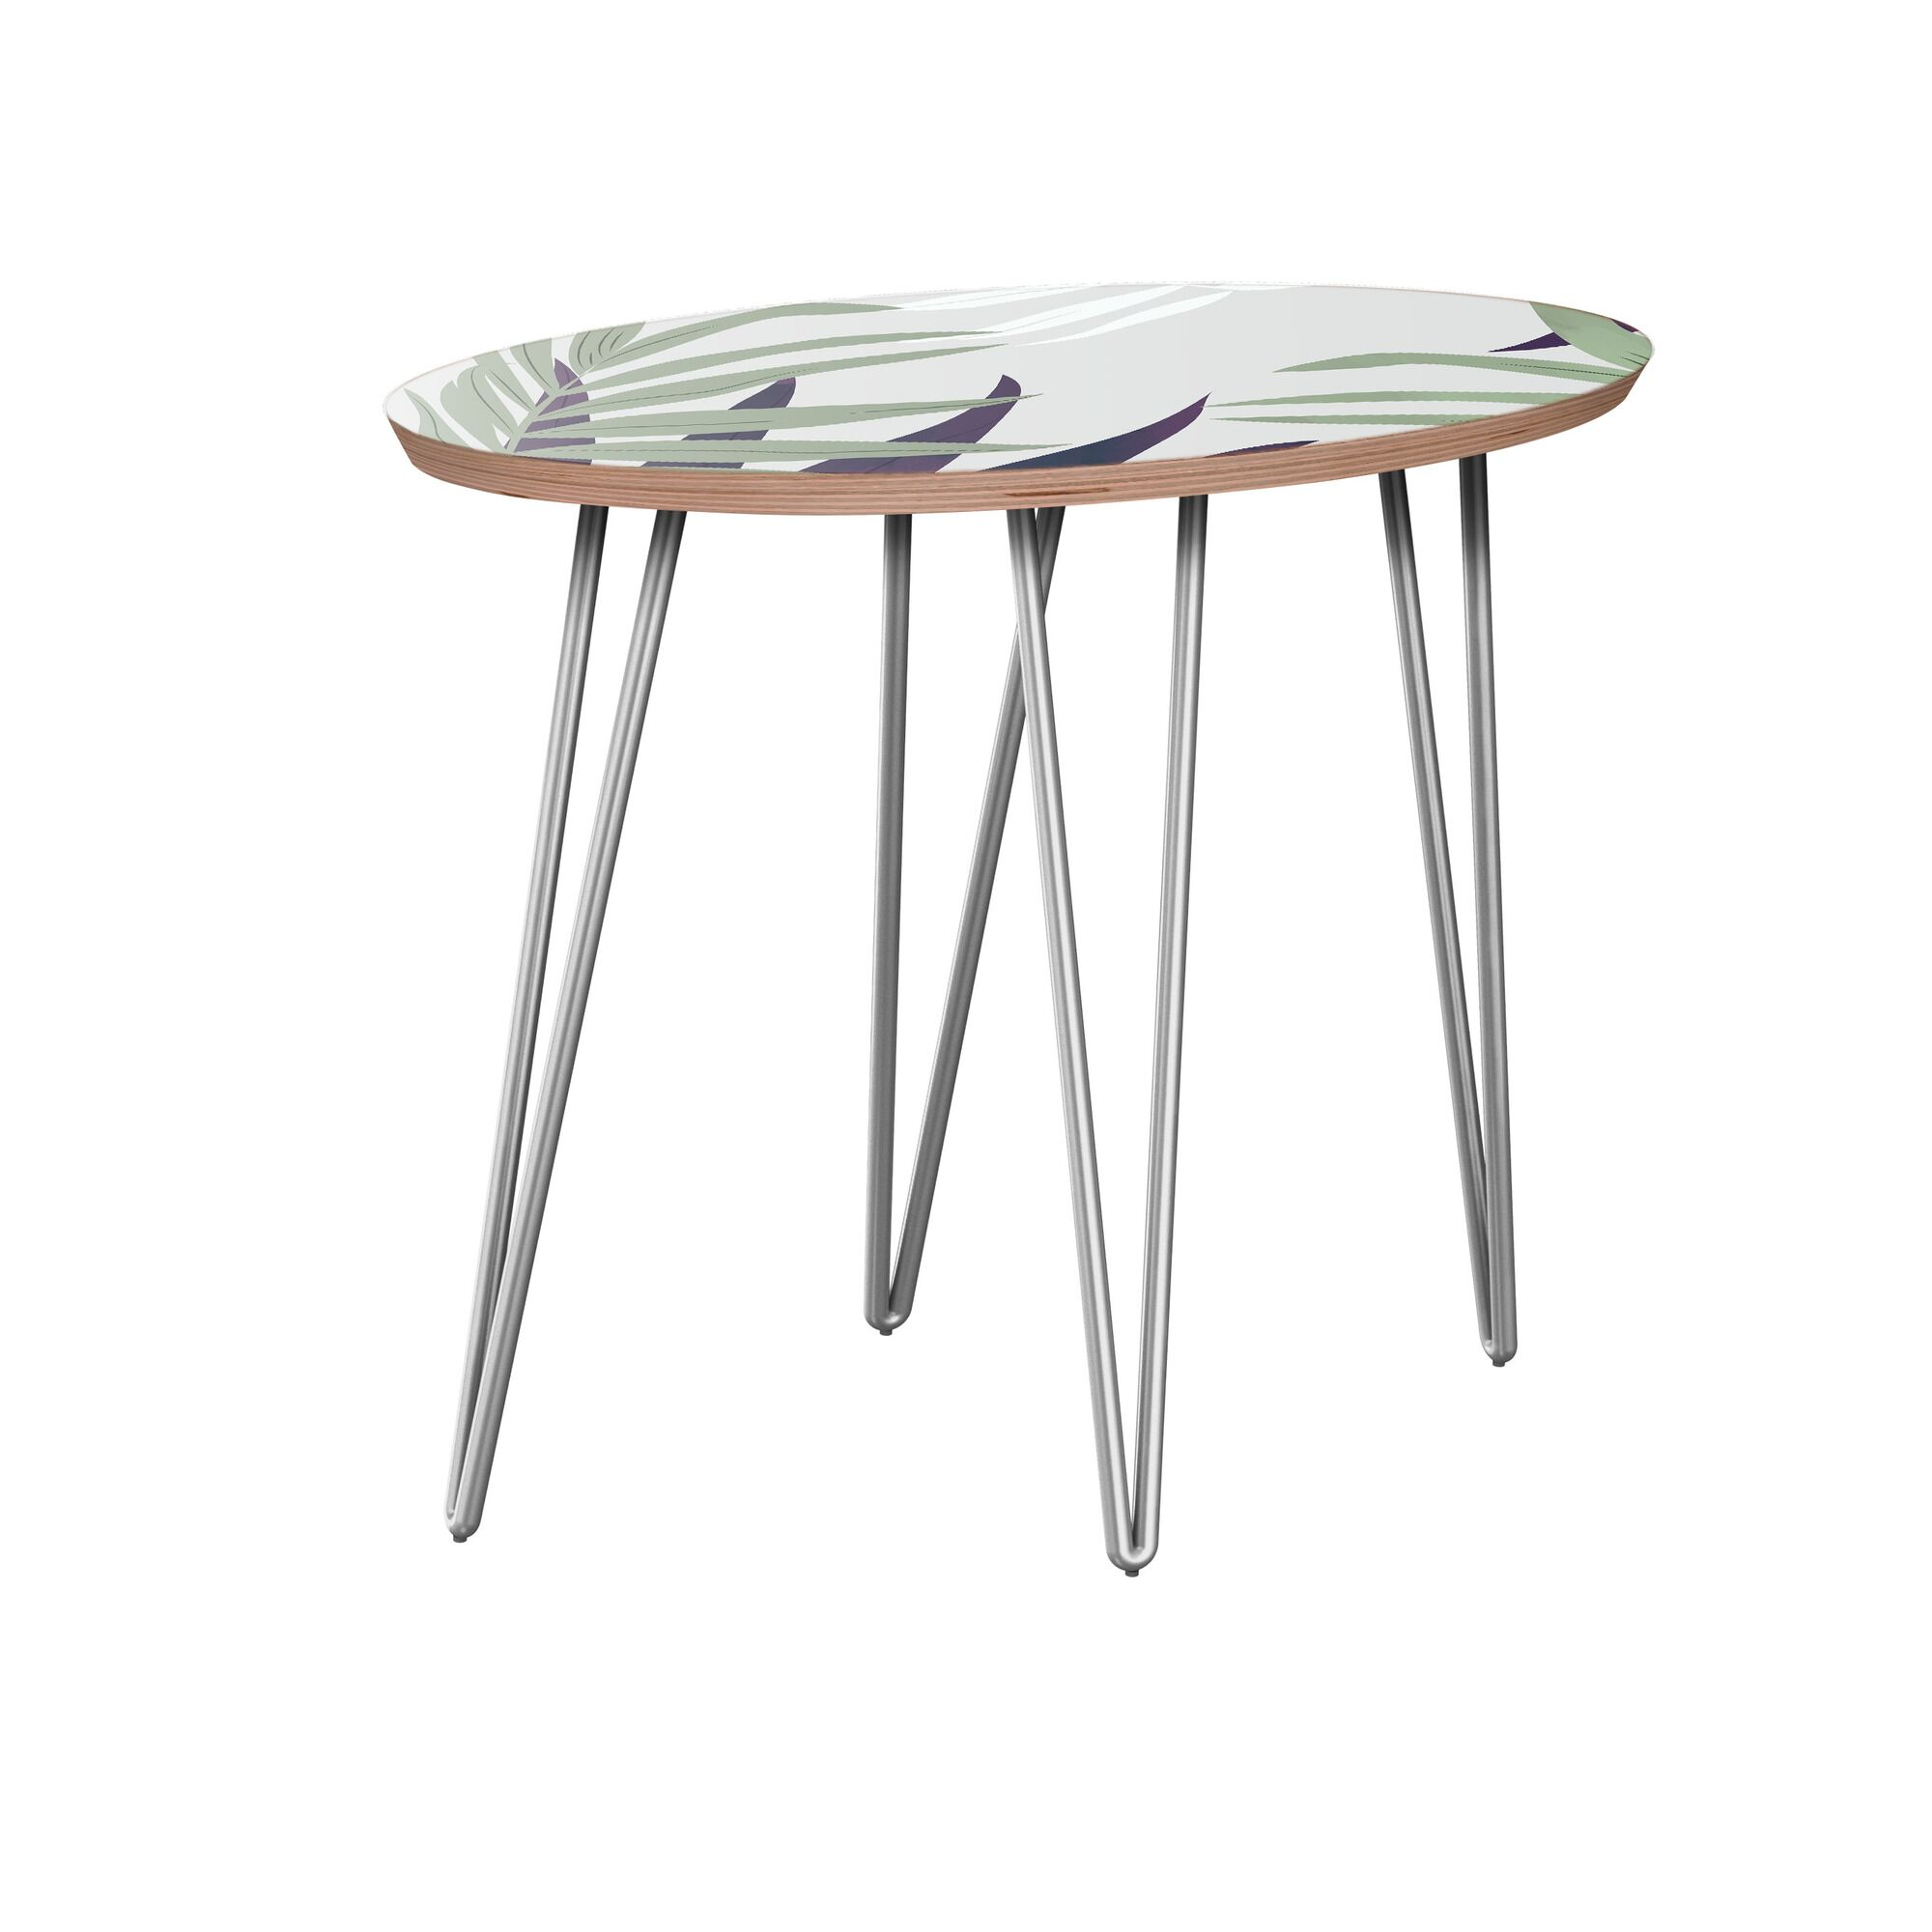 Kotomo End Table Table Base Color: Chrome, Table Top Color: Walnut